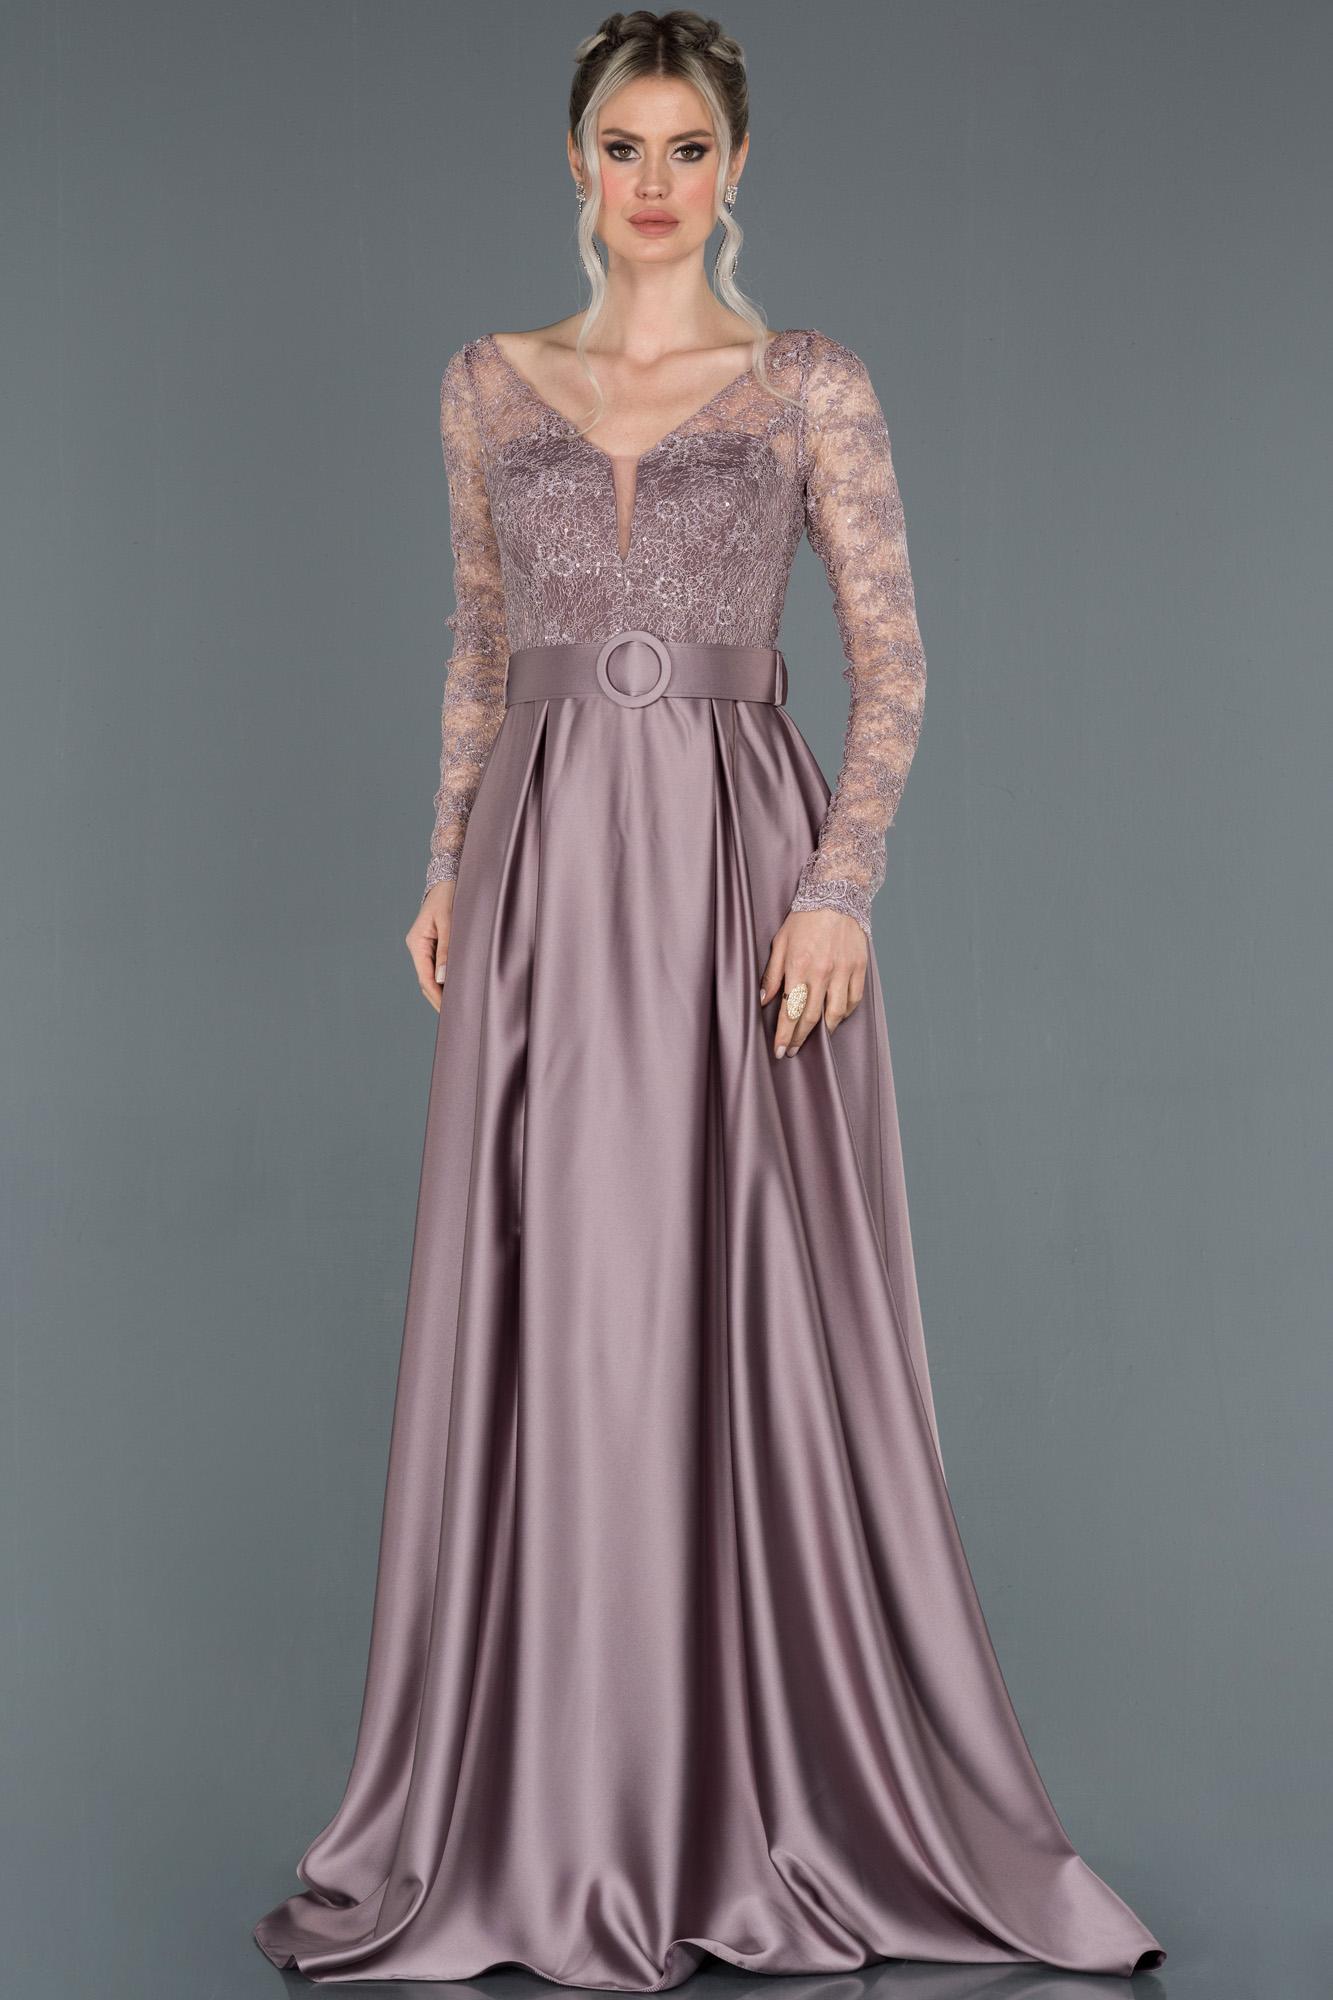 Lavanta Transparan Kol Kemerli Saten Abiye Elbise